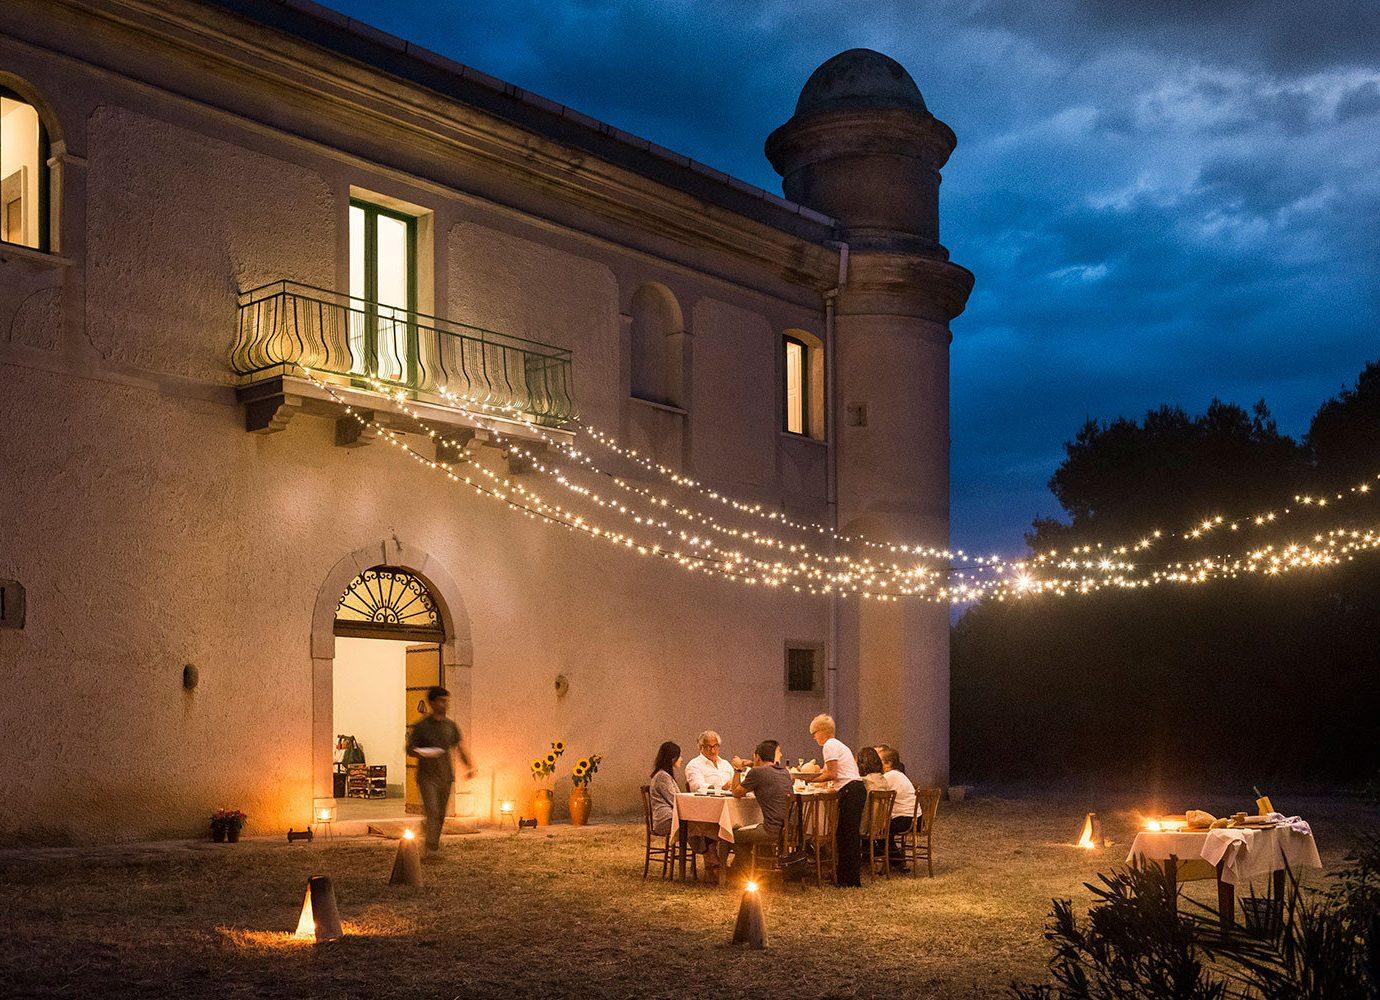 Jetsetter Guides outdoor building night light evening darkness lighting christmas decoration